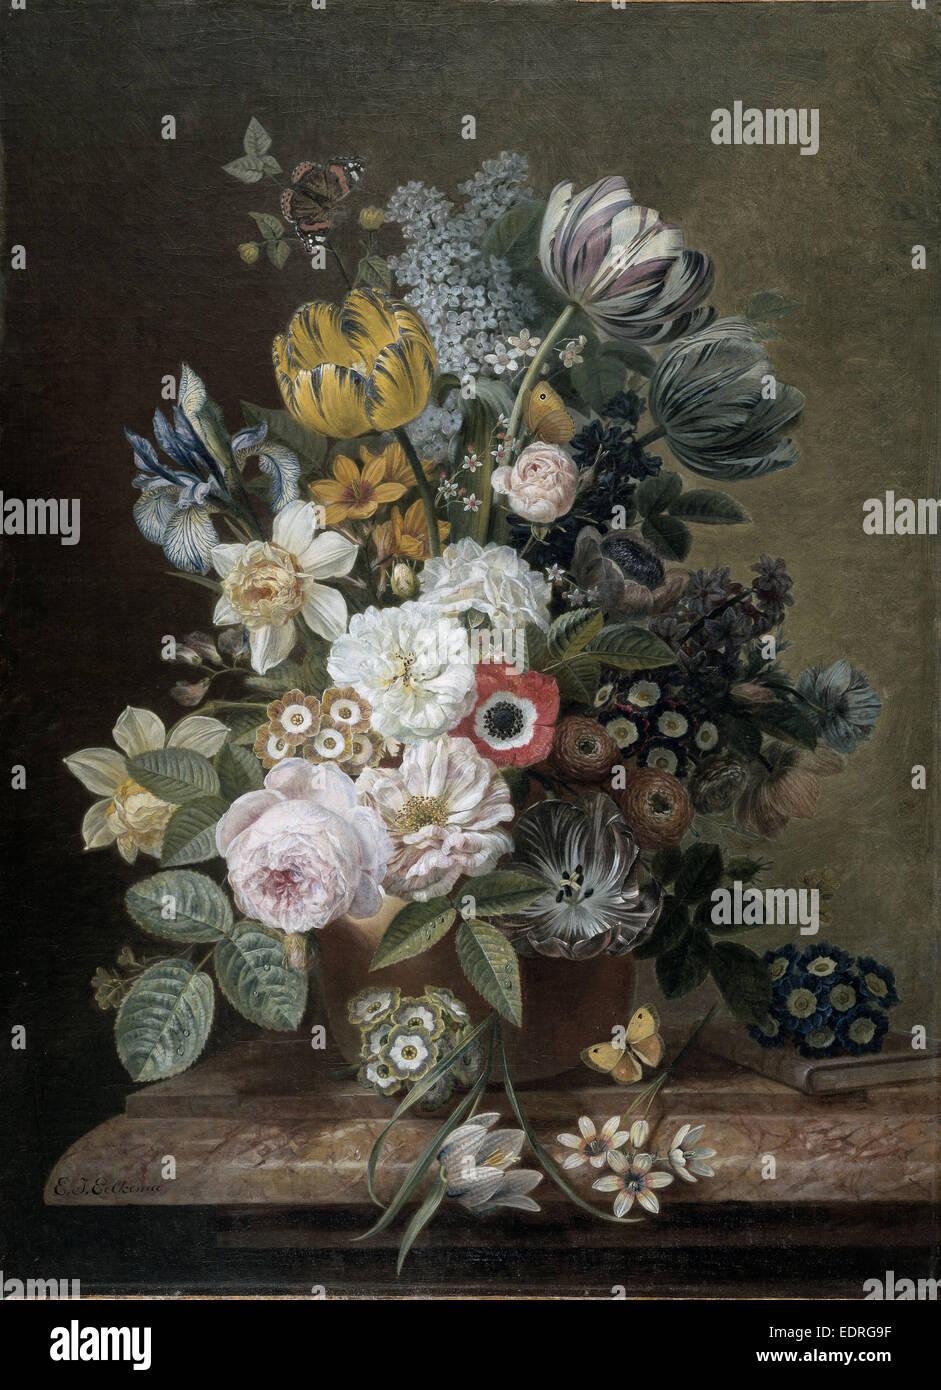 Nature morte avec fleurs, Eelke Jelles Eelkema, 1815 - 1839 Photo Stock